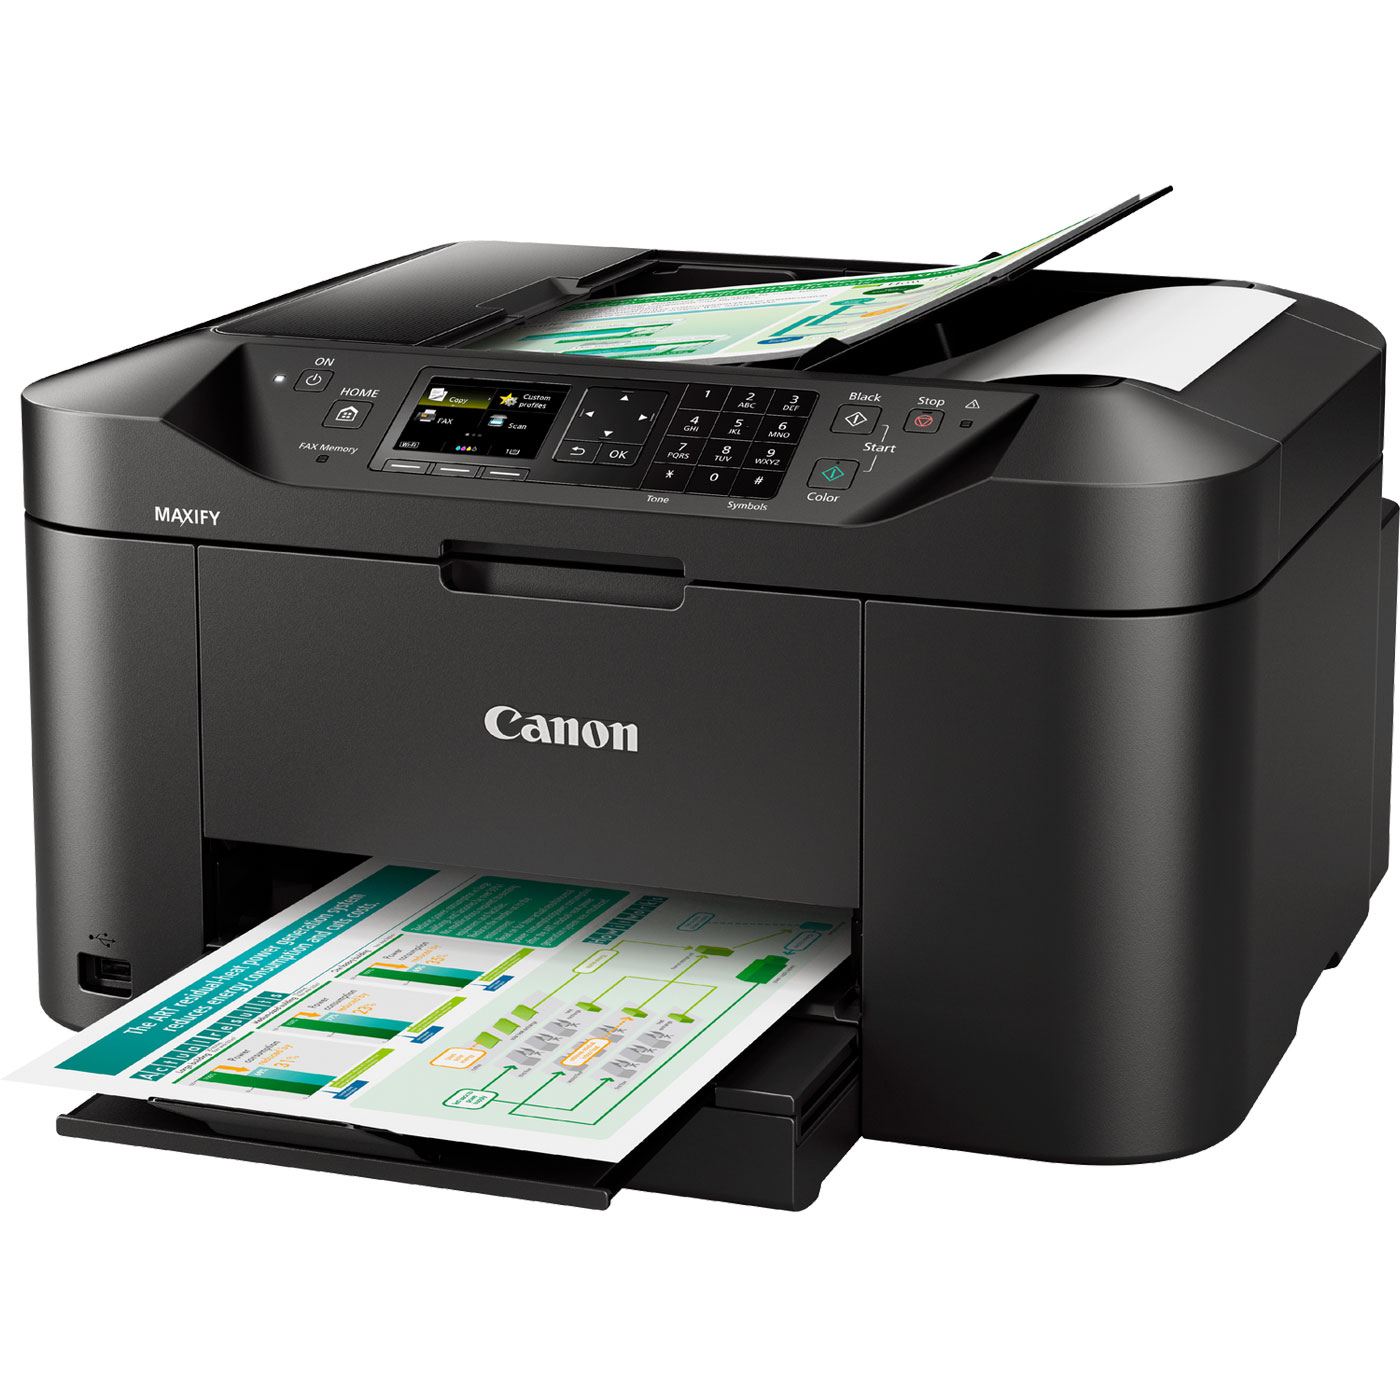 canon maxify mb2150 imprimante multifonction canon sur. Black Bedroom Furniture Sets. Home Design Ideas